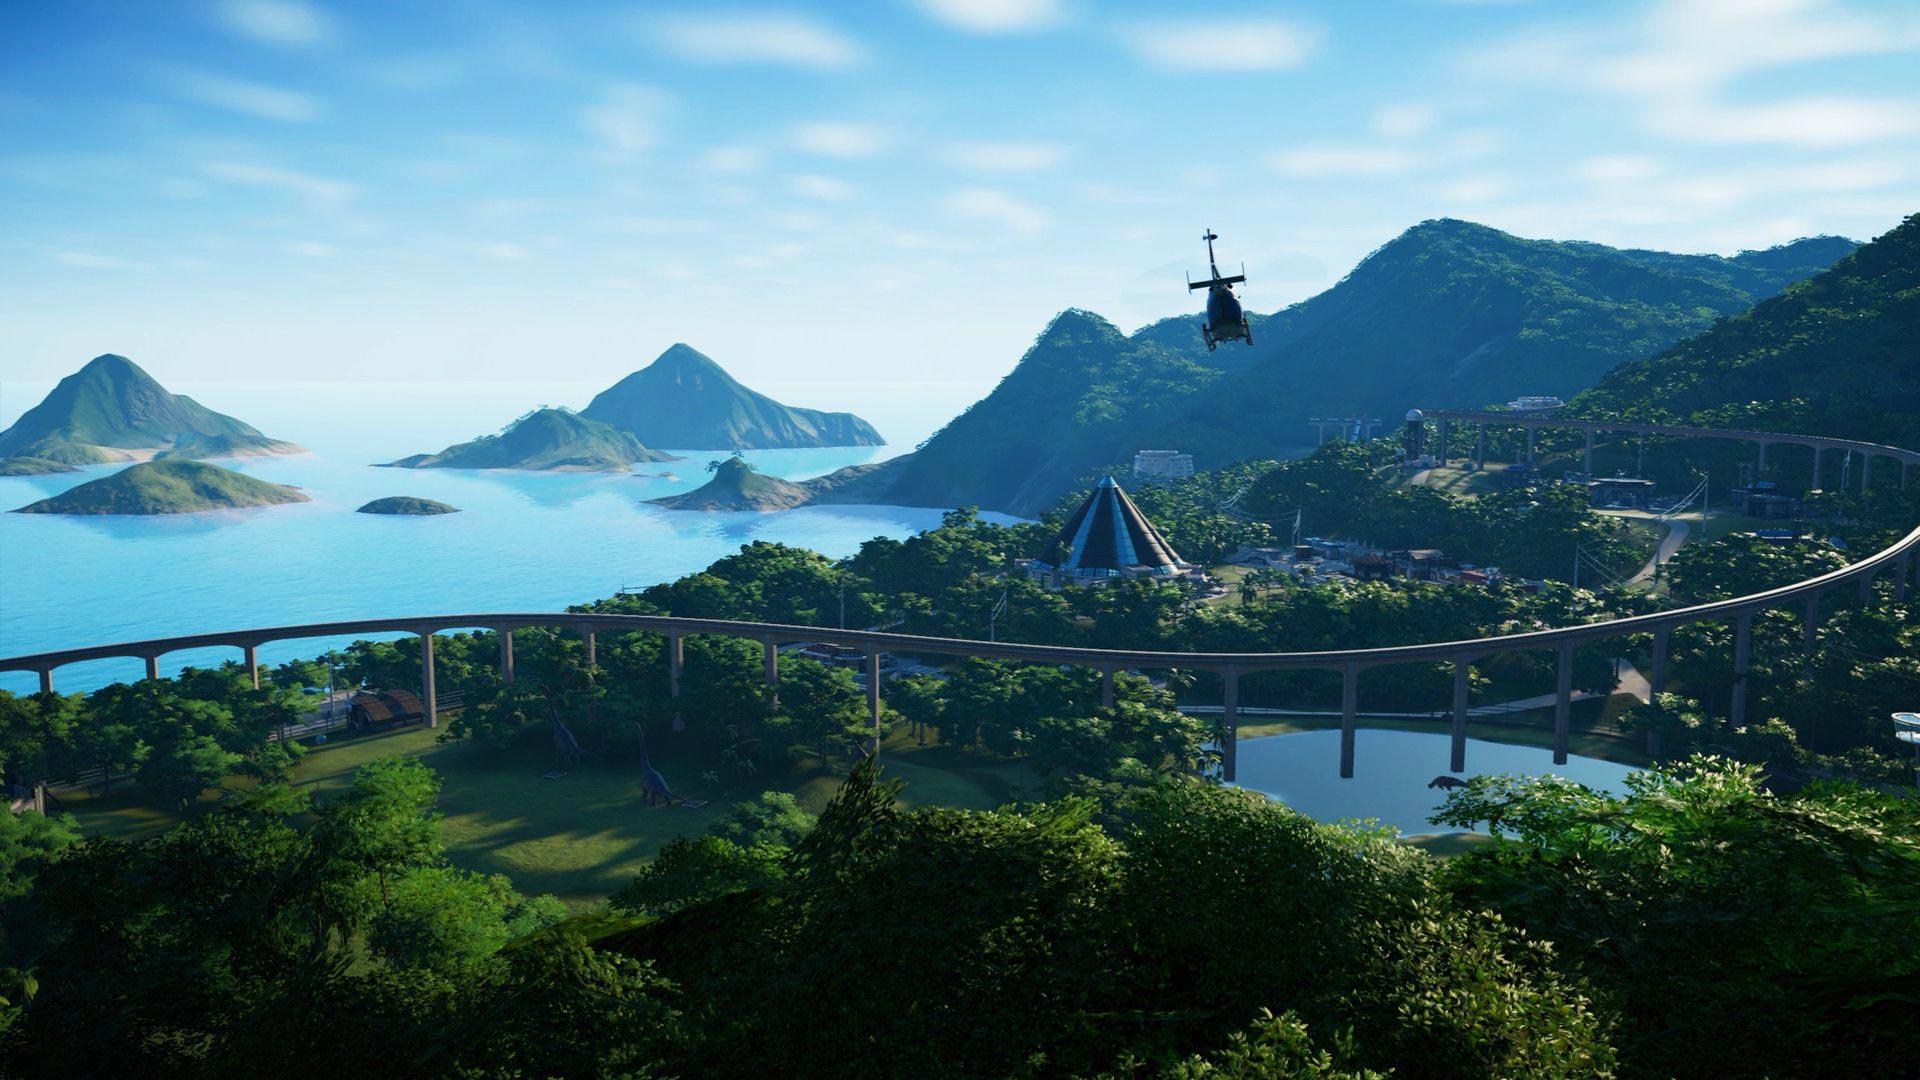 Park simulator monorail eiland isla Nublar